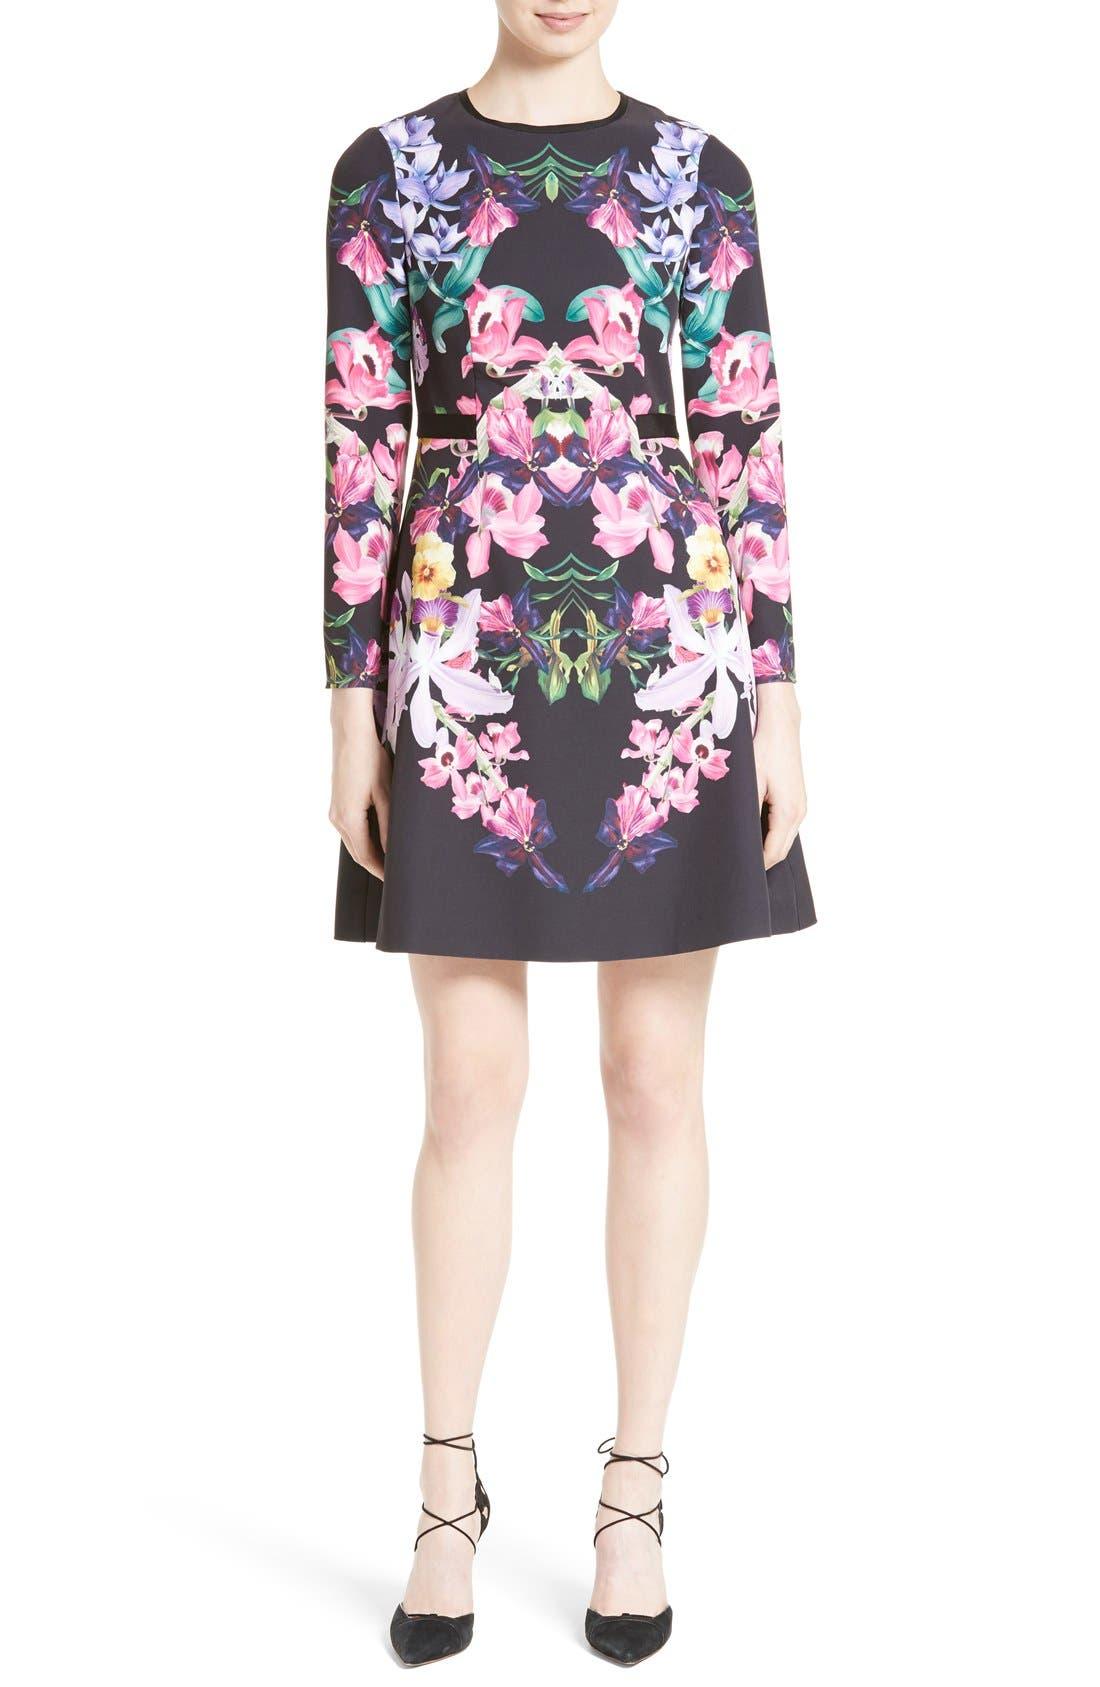 Alternate Image 1 Selected - Ted Baker London Lost Garden Fit & Flare Dress